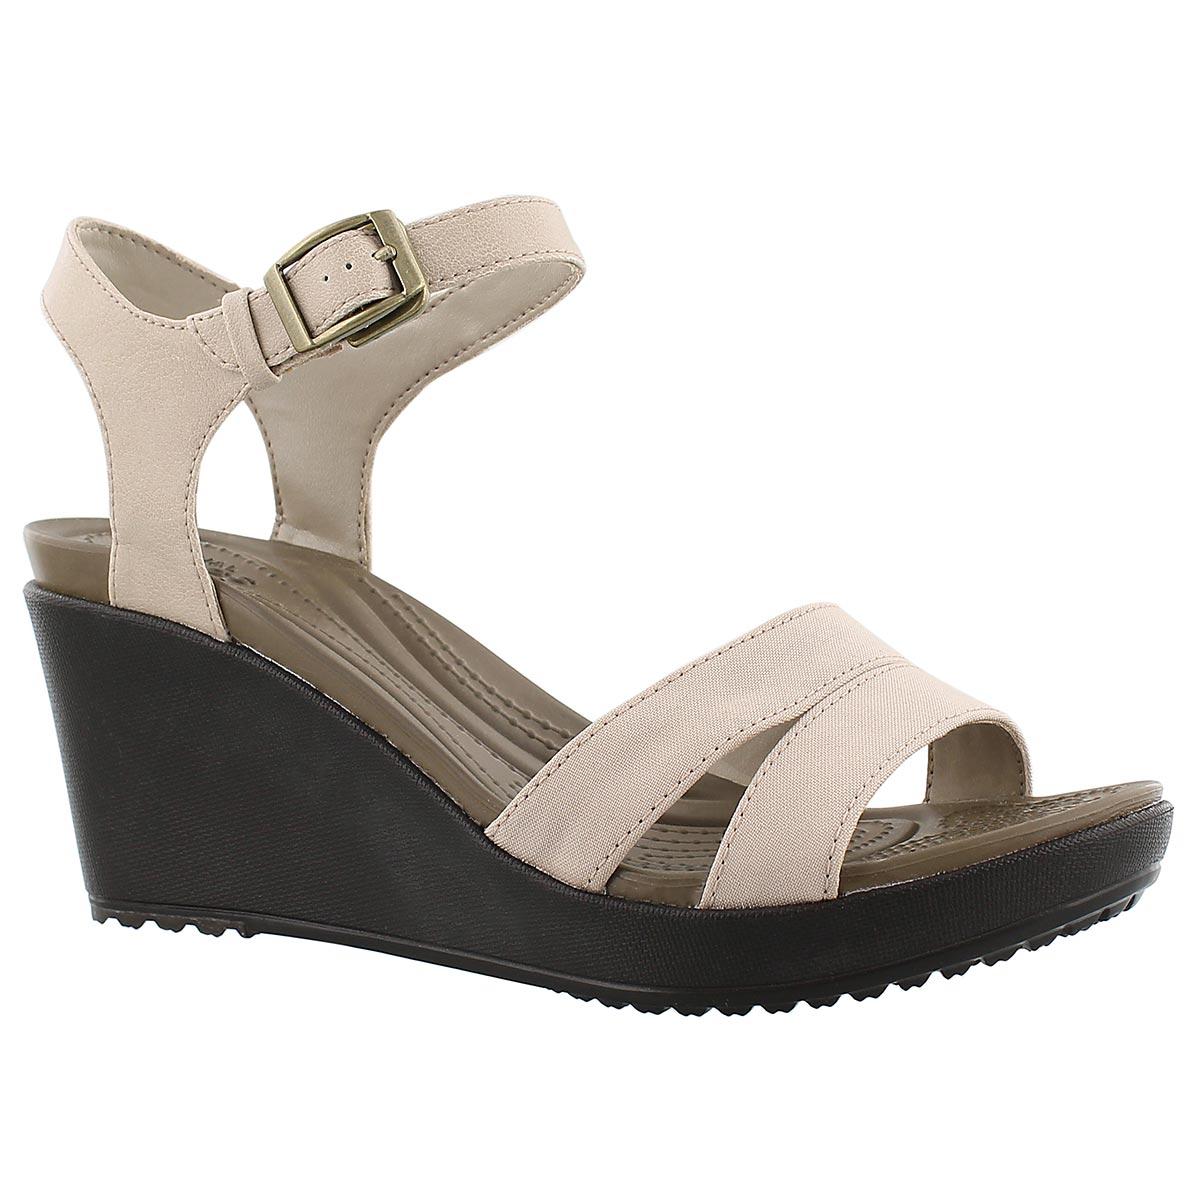 Women's LEIGH II tumbleweed wedge sandals